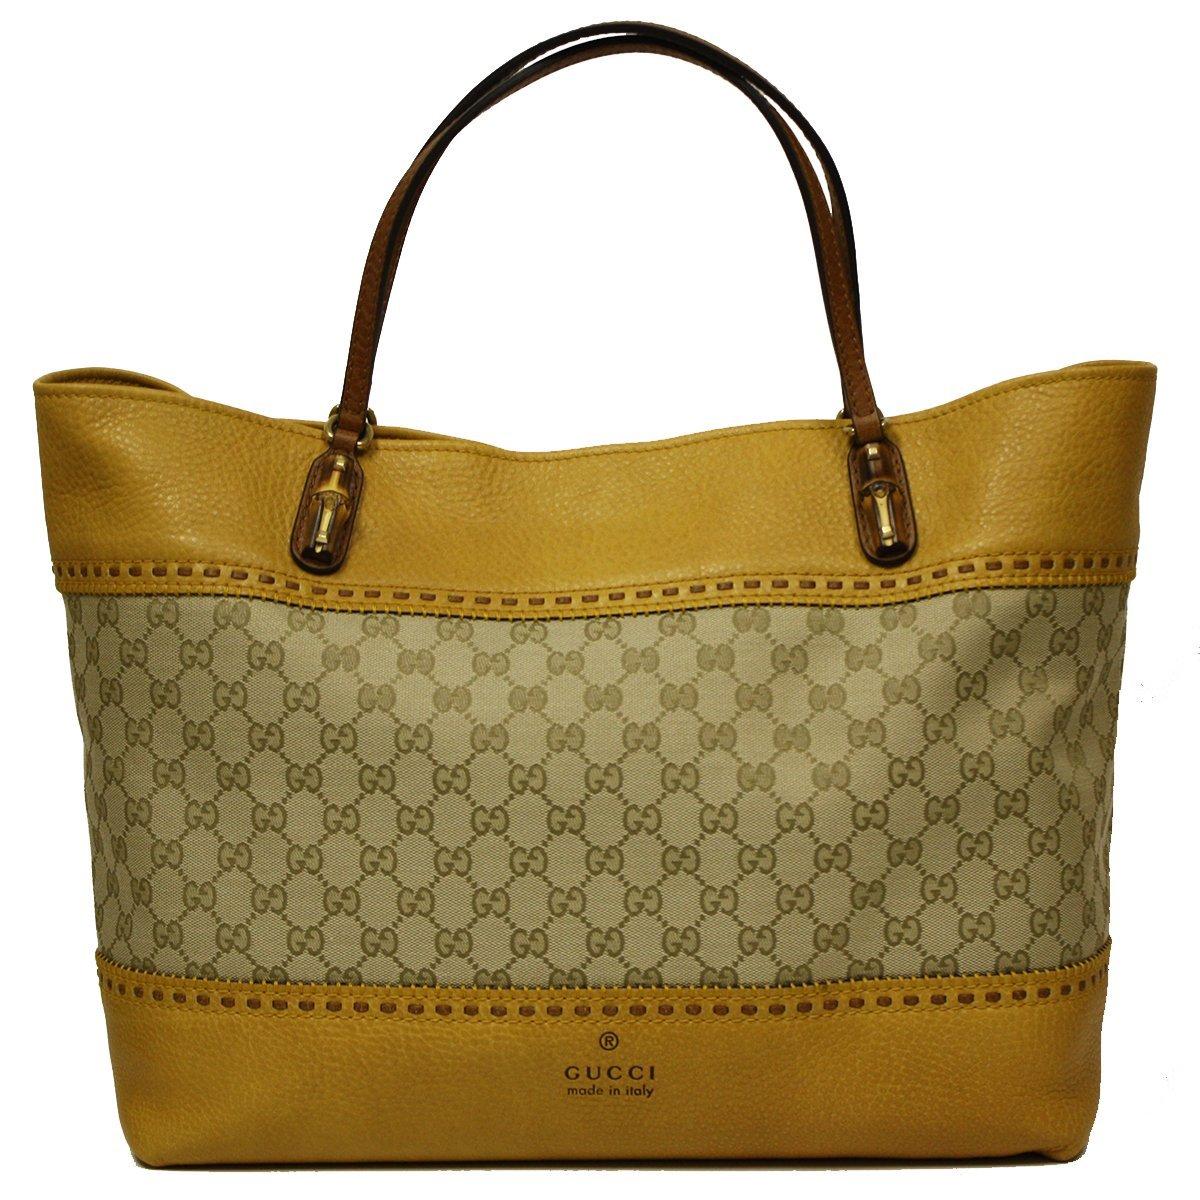 b912f13c228a Amazon.com: Gucci Hilary Lux Diamante Medium Leather Tote Bag 353397 - Cove  Blue: Shoes